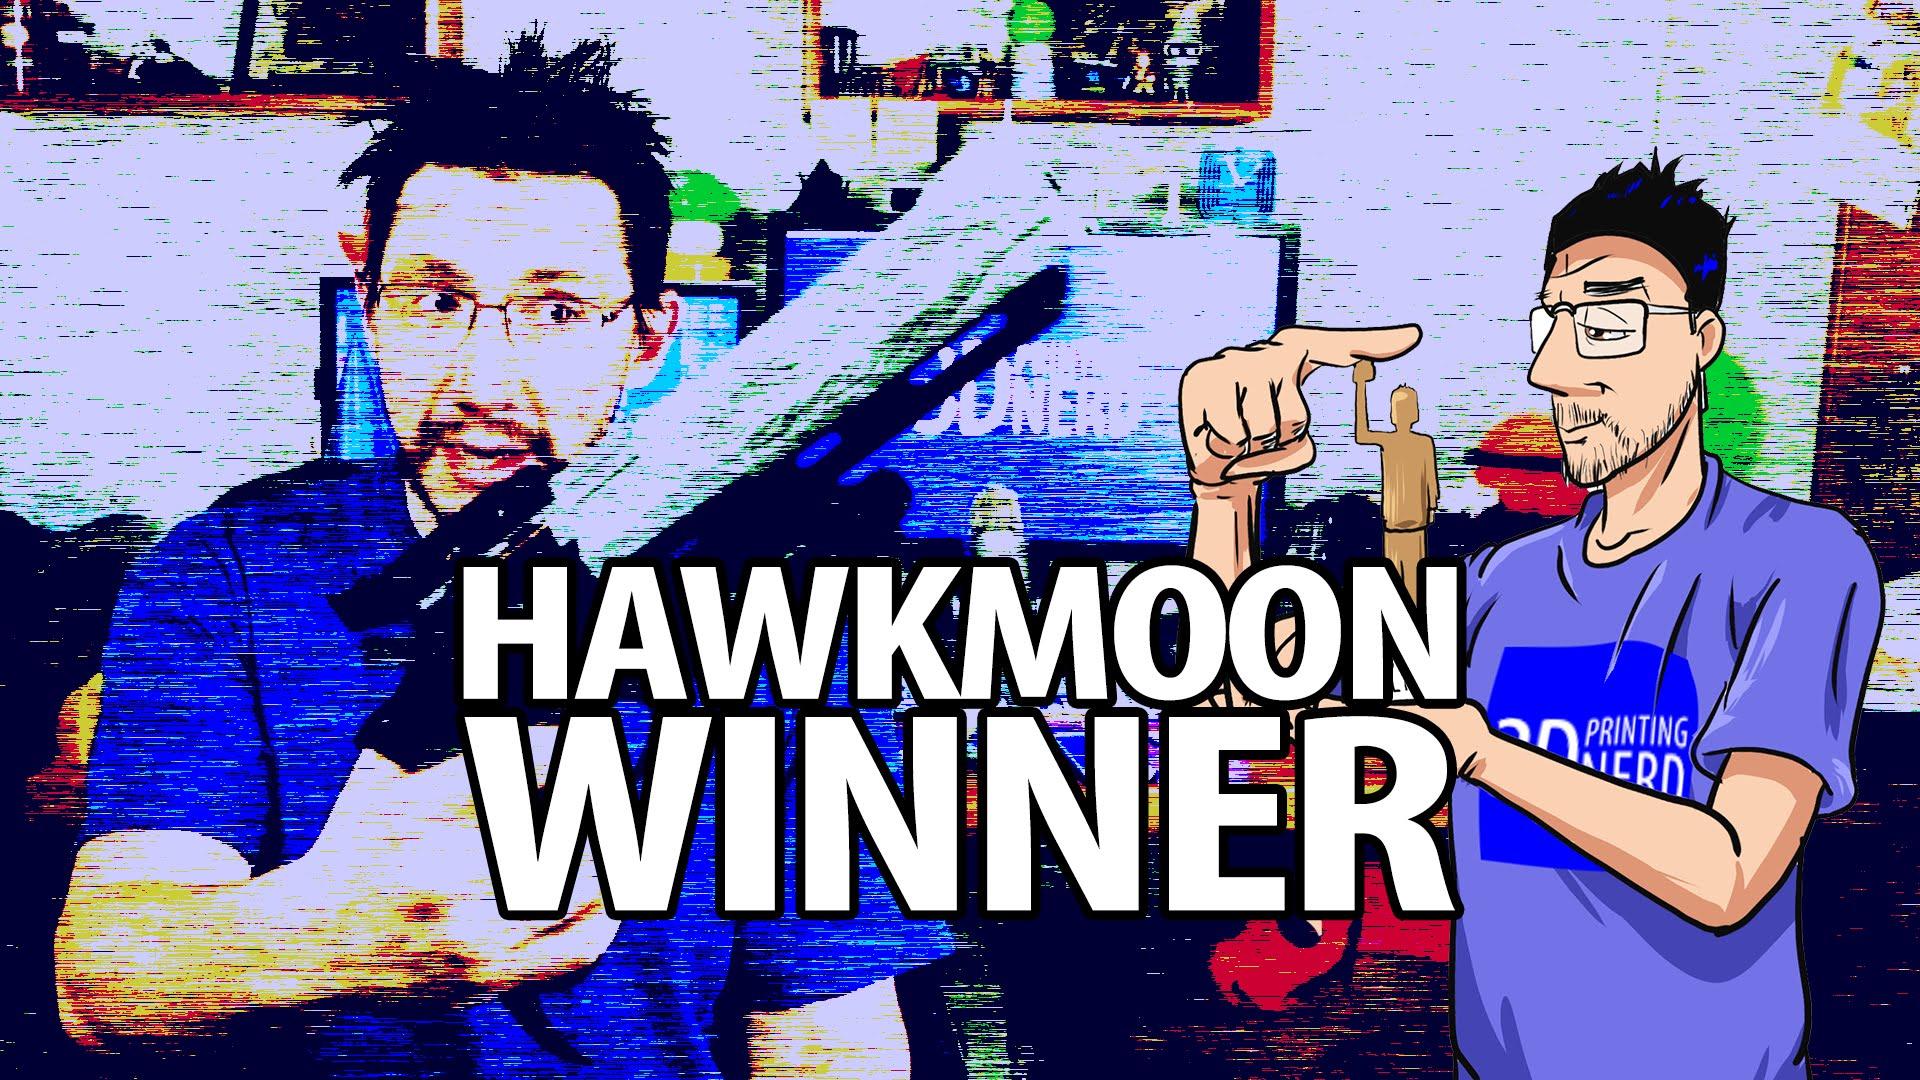 3D Printed Hawkmoon WInner Announced